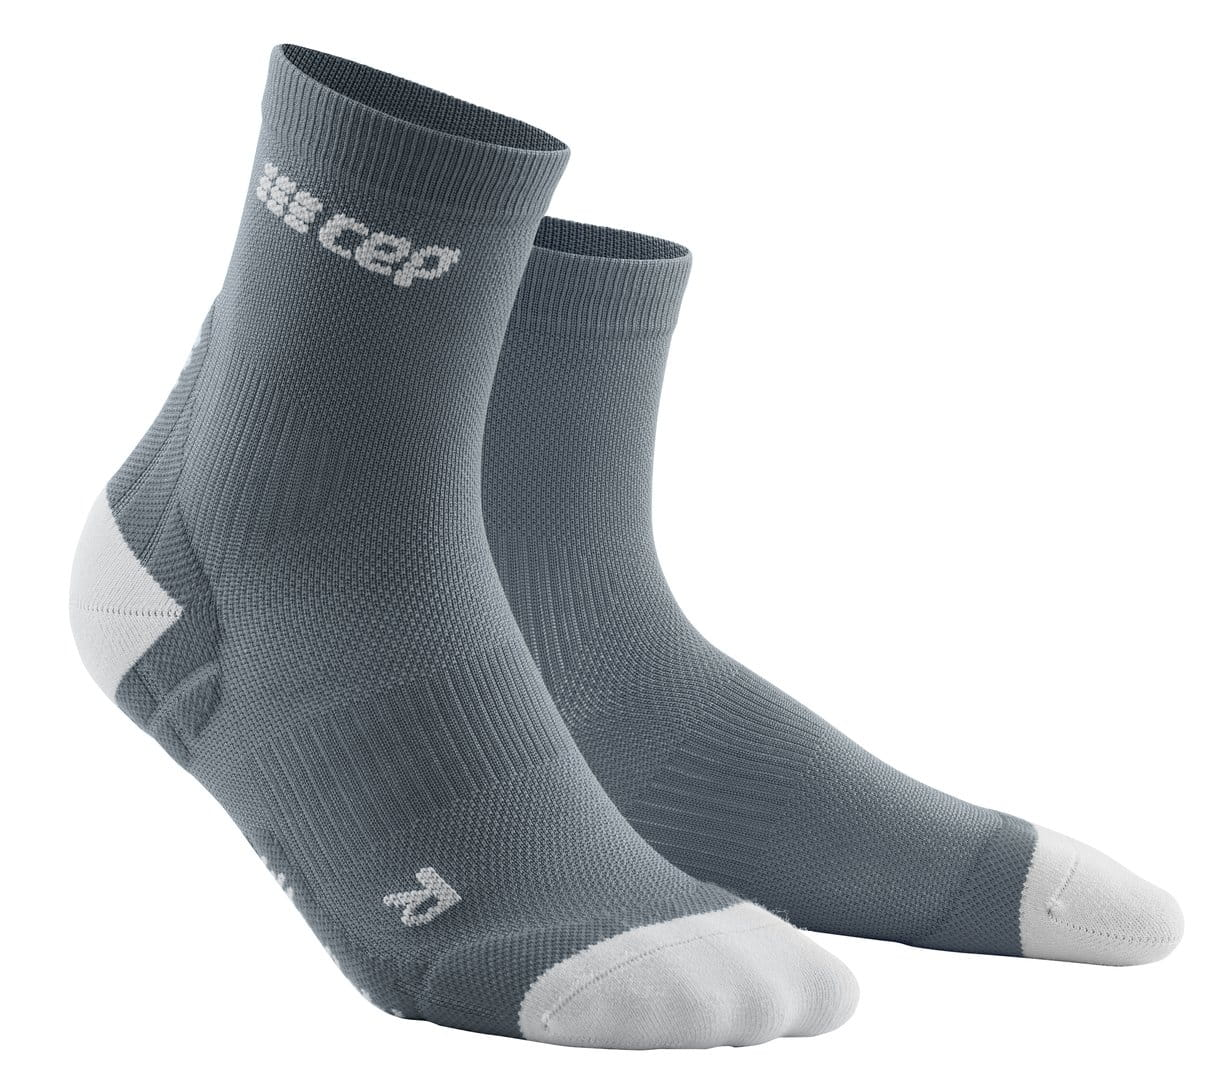 Pánske krátke ponožky CEP Krátke ponožky ULTRALIGHT pánske